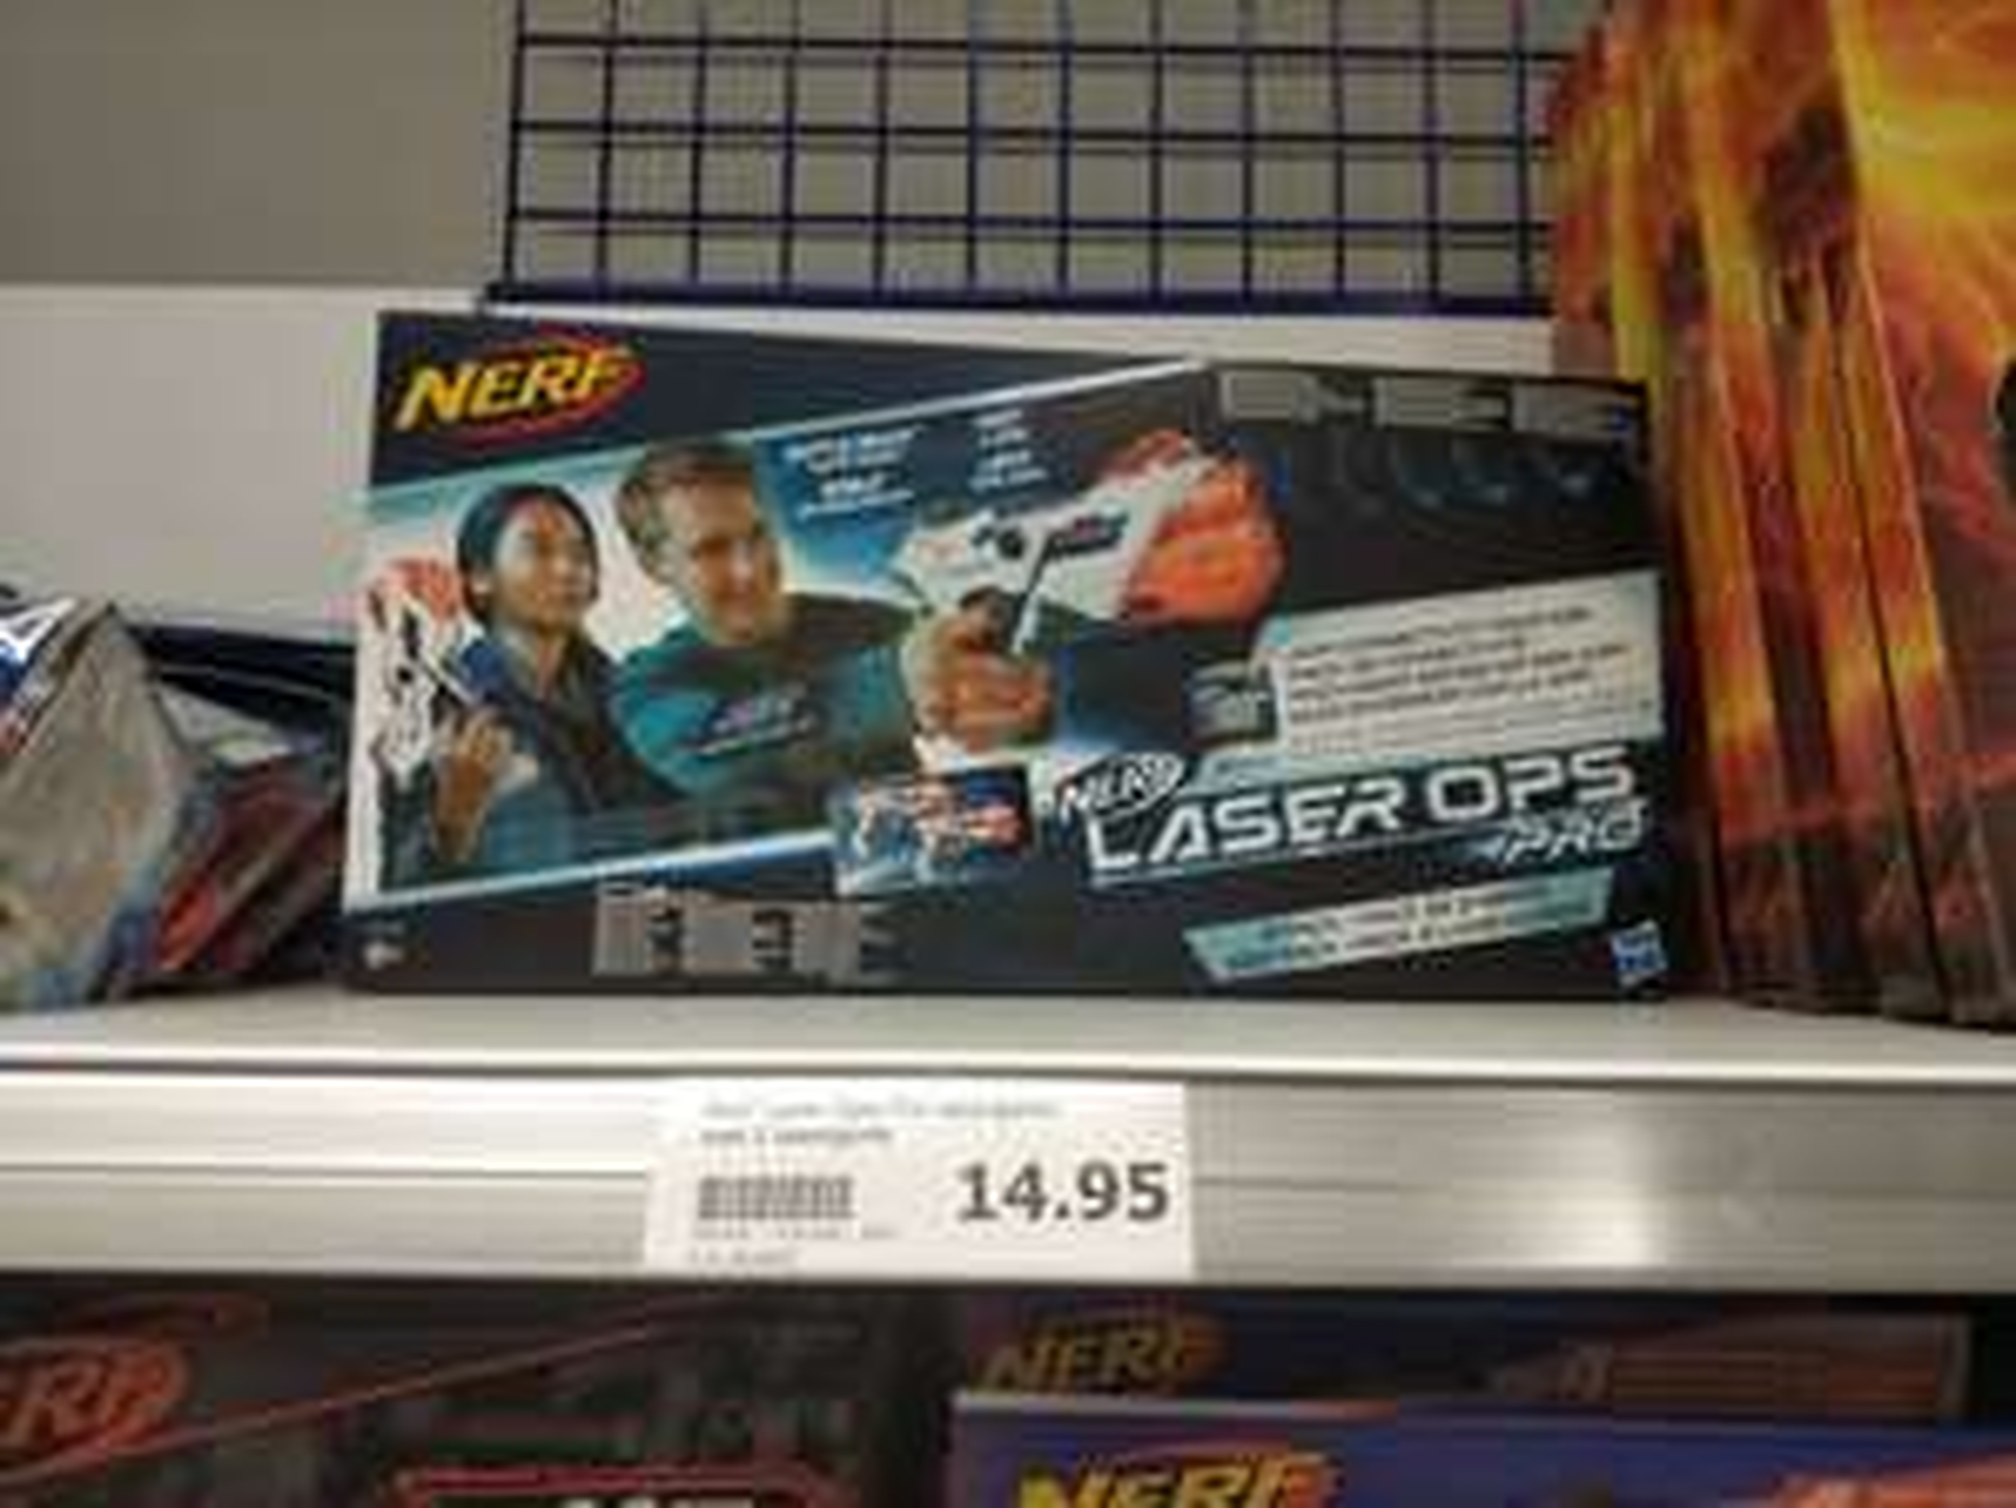 NERF Laser Ops Pro 2 pack @Action